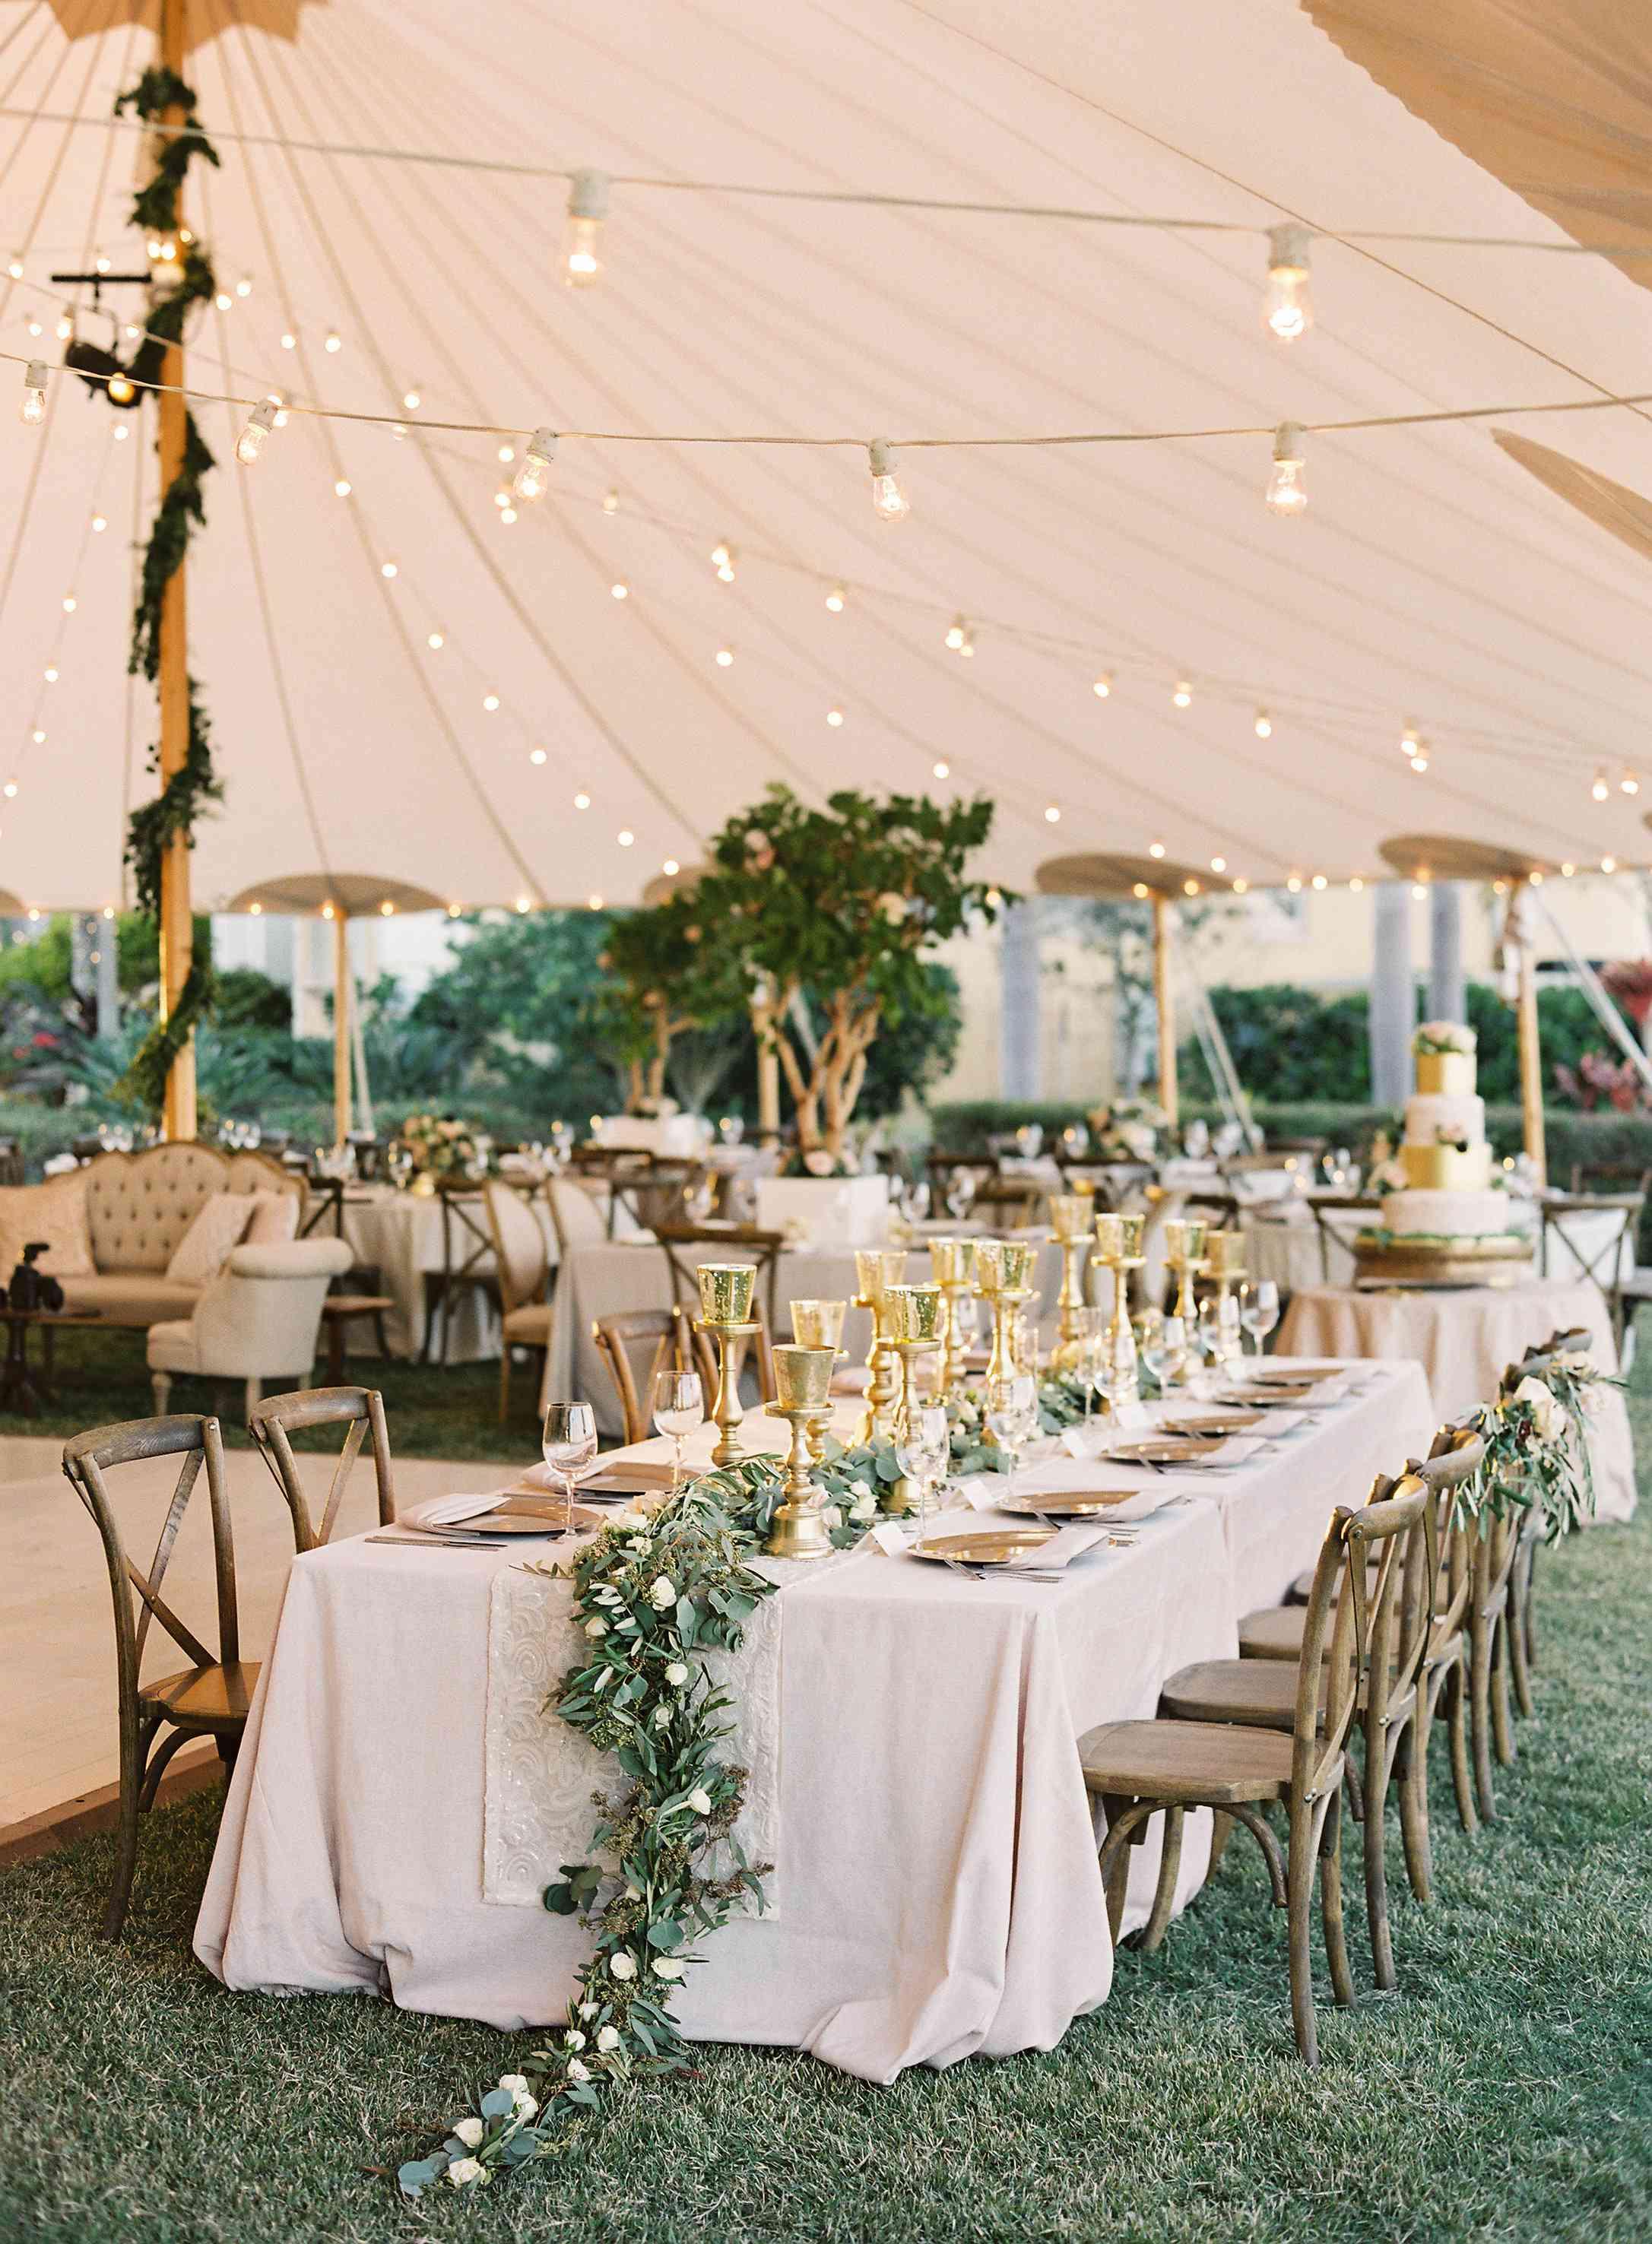 A wedding reception table setup